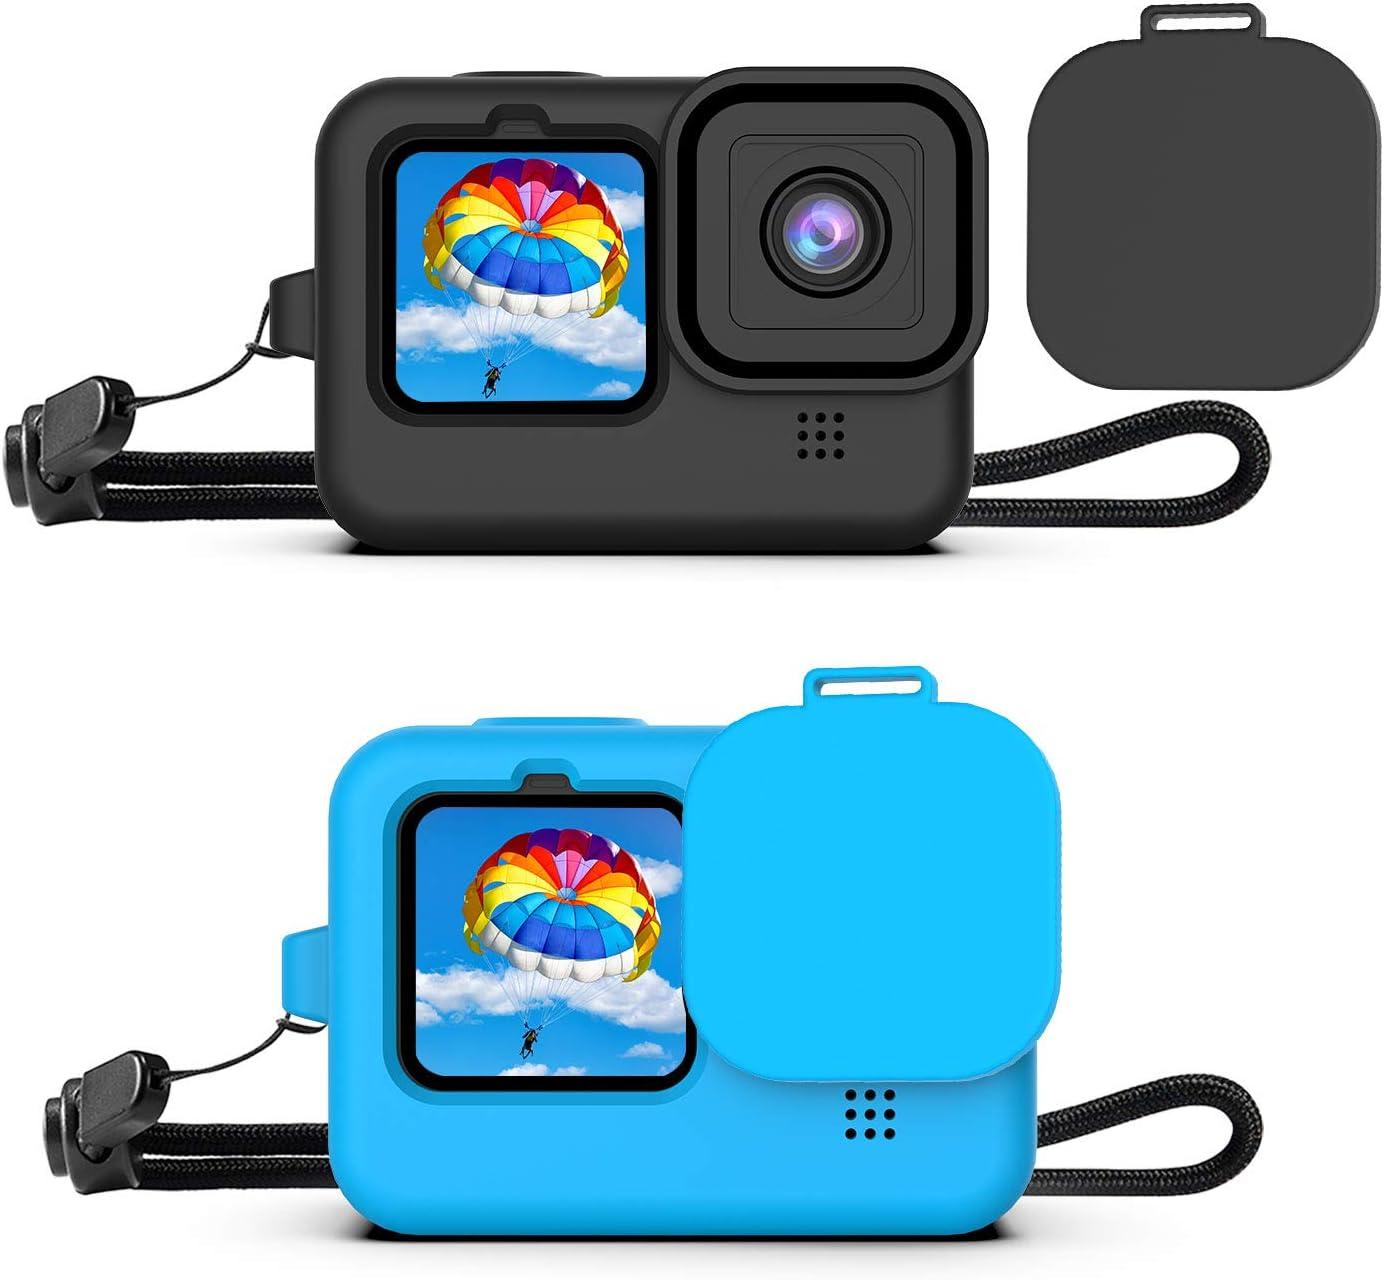 2 fundas de silicona para GoPro Hero 9 Black